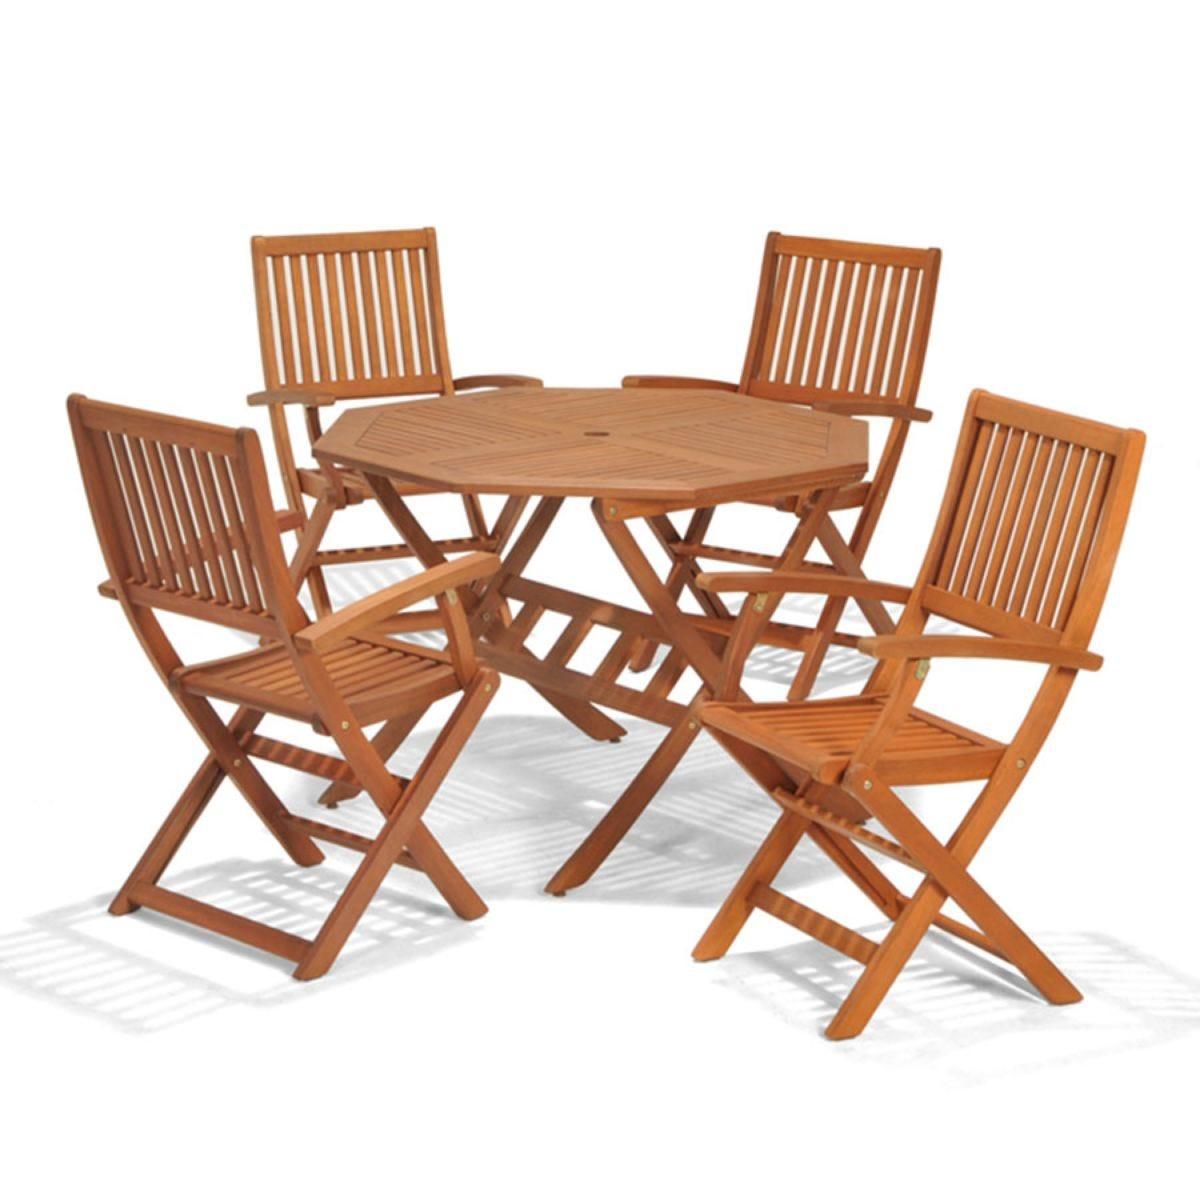 Robert Dyas FSC Country Hardwood 4-Seater Dining Set